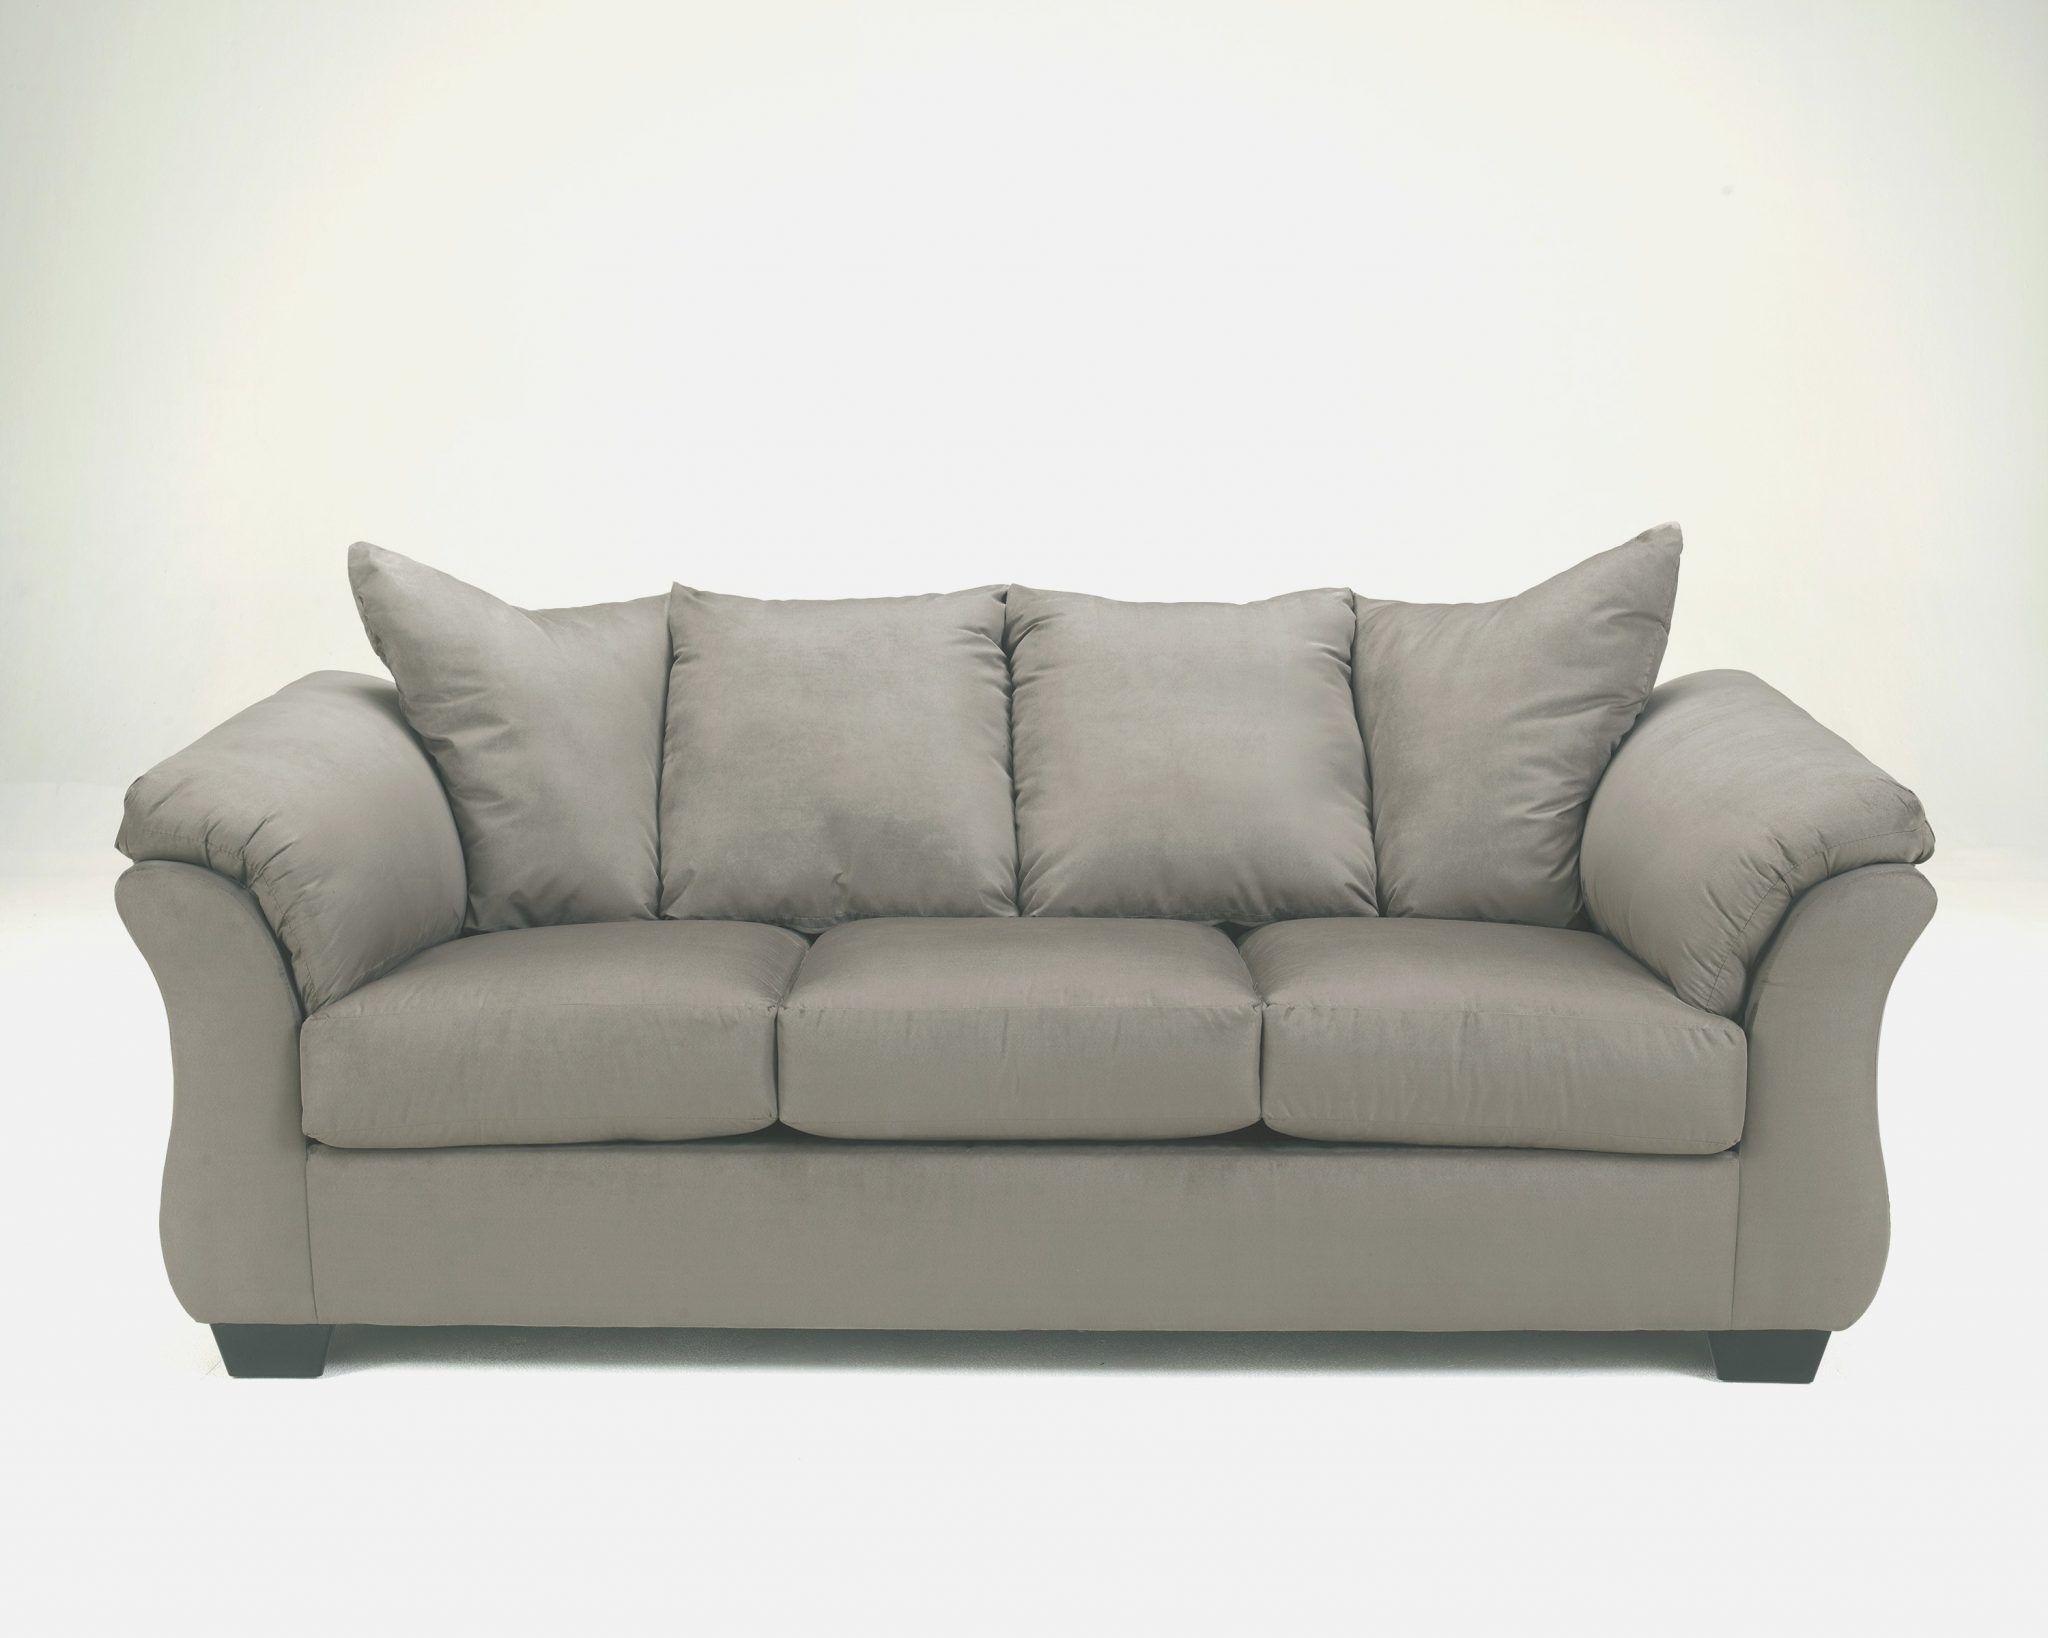 ashley leather sofas and loveseats cb2 apartment sofa loveseat abbyson living premium top grain brown